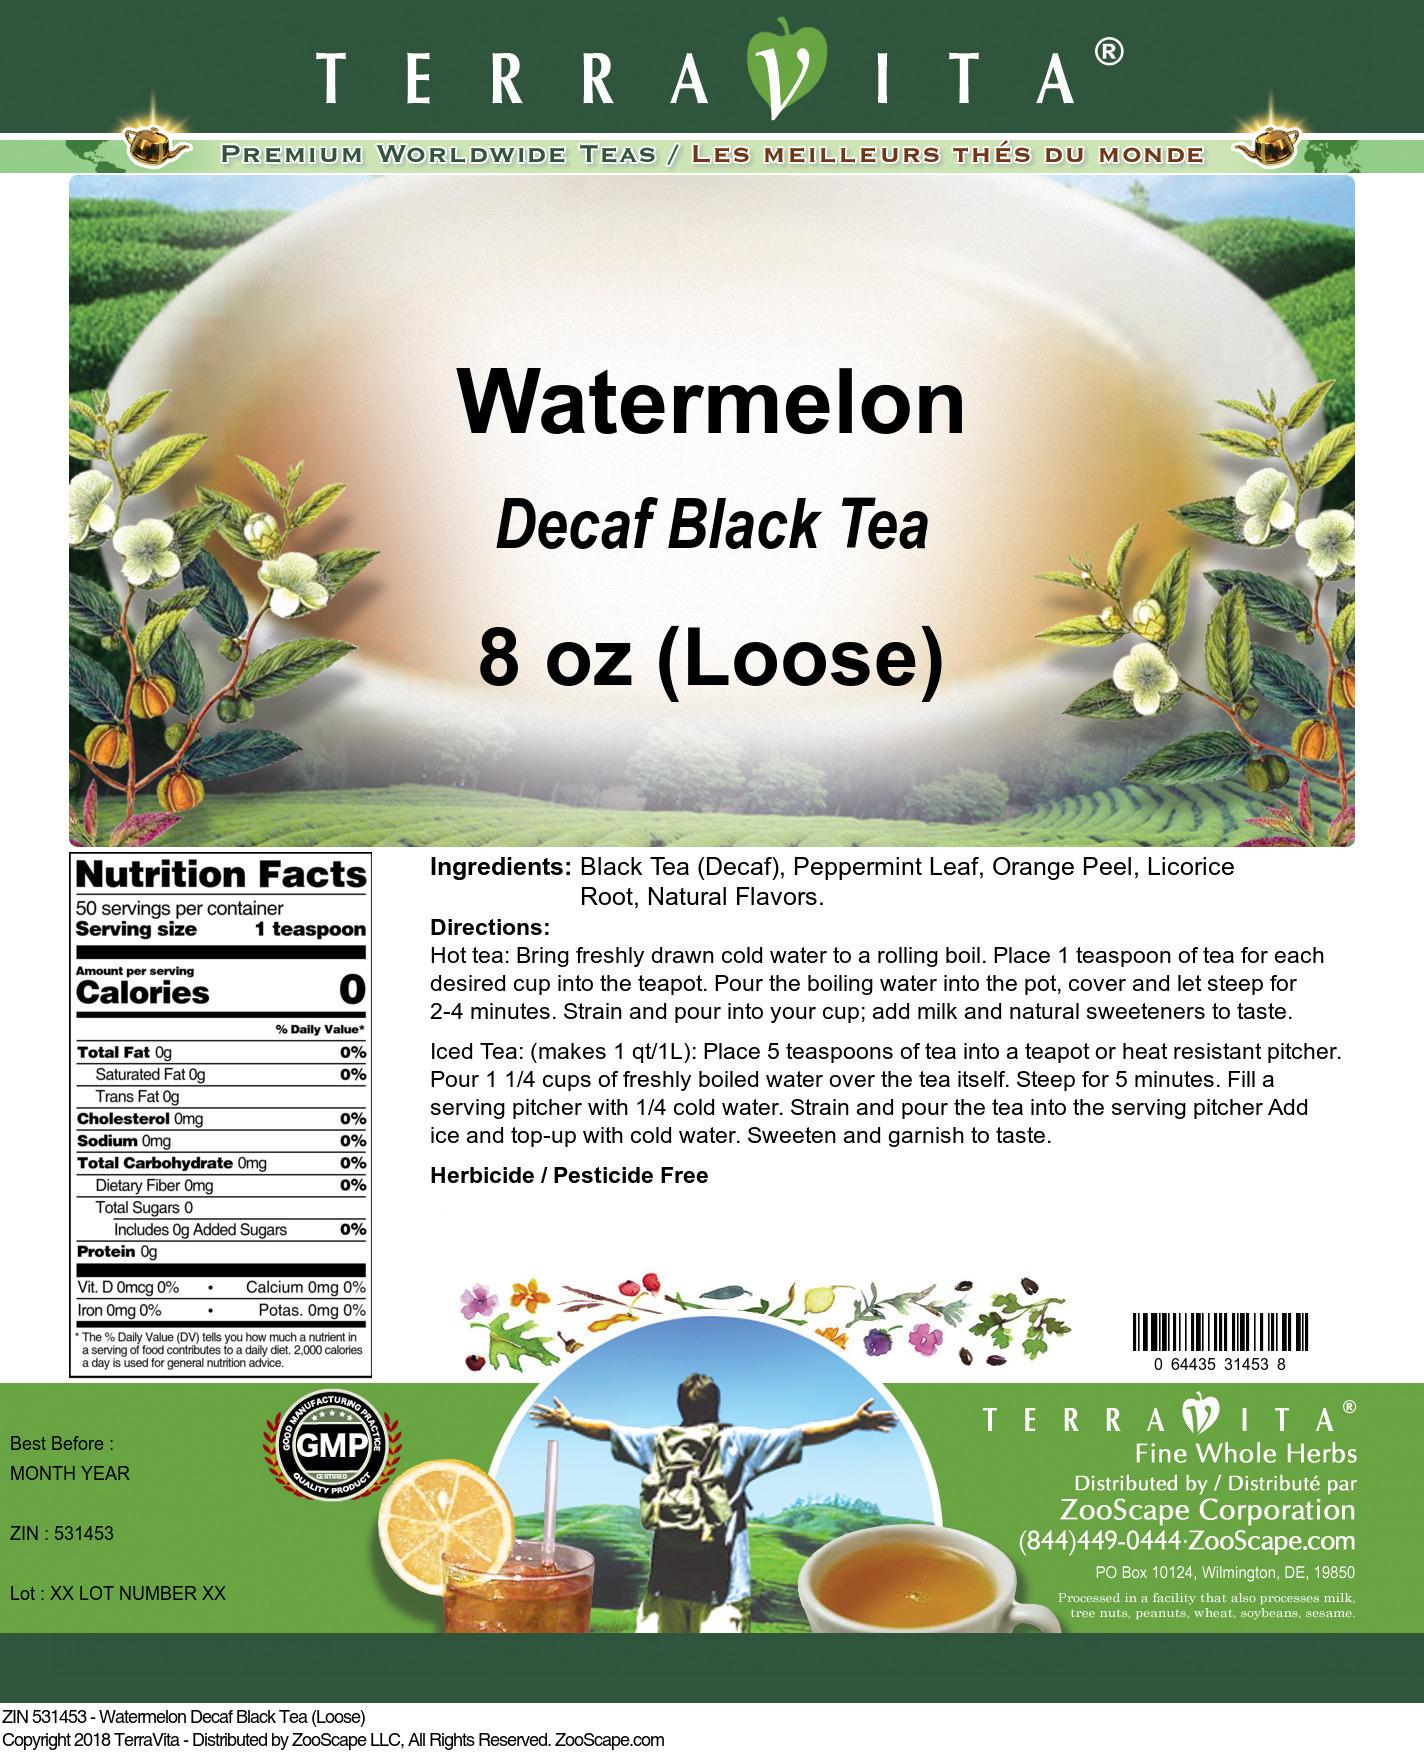 Watermelon Decaf Black Tea (Loose)